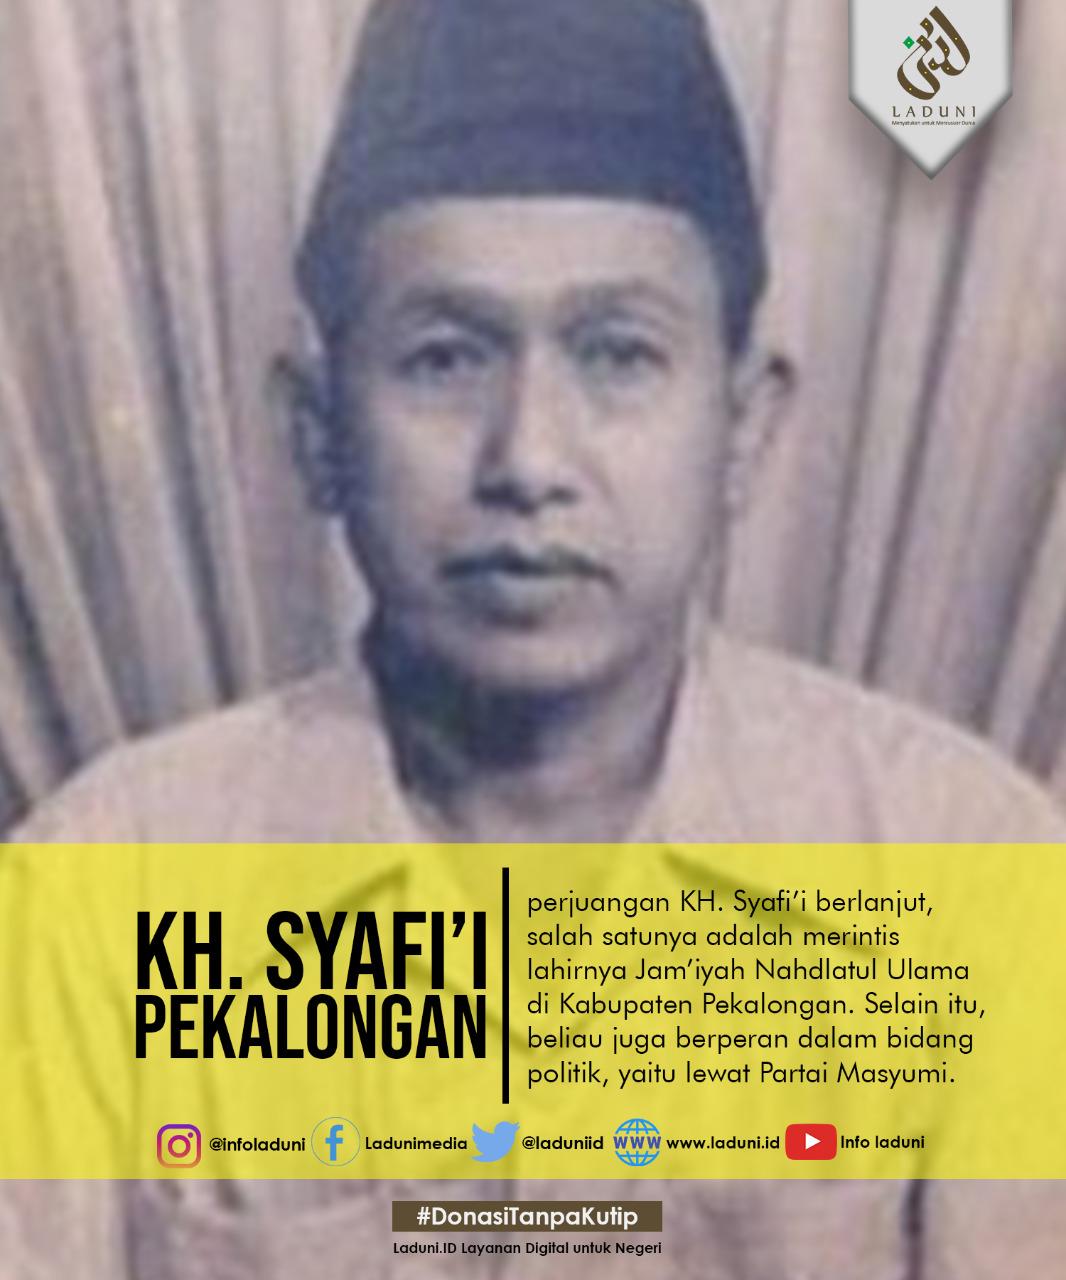 Biografi KH. Syafi'i Pekalongan